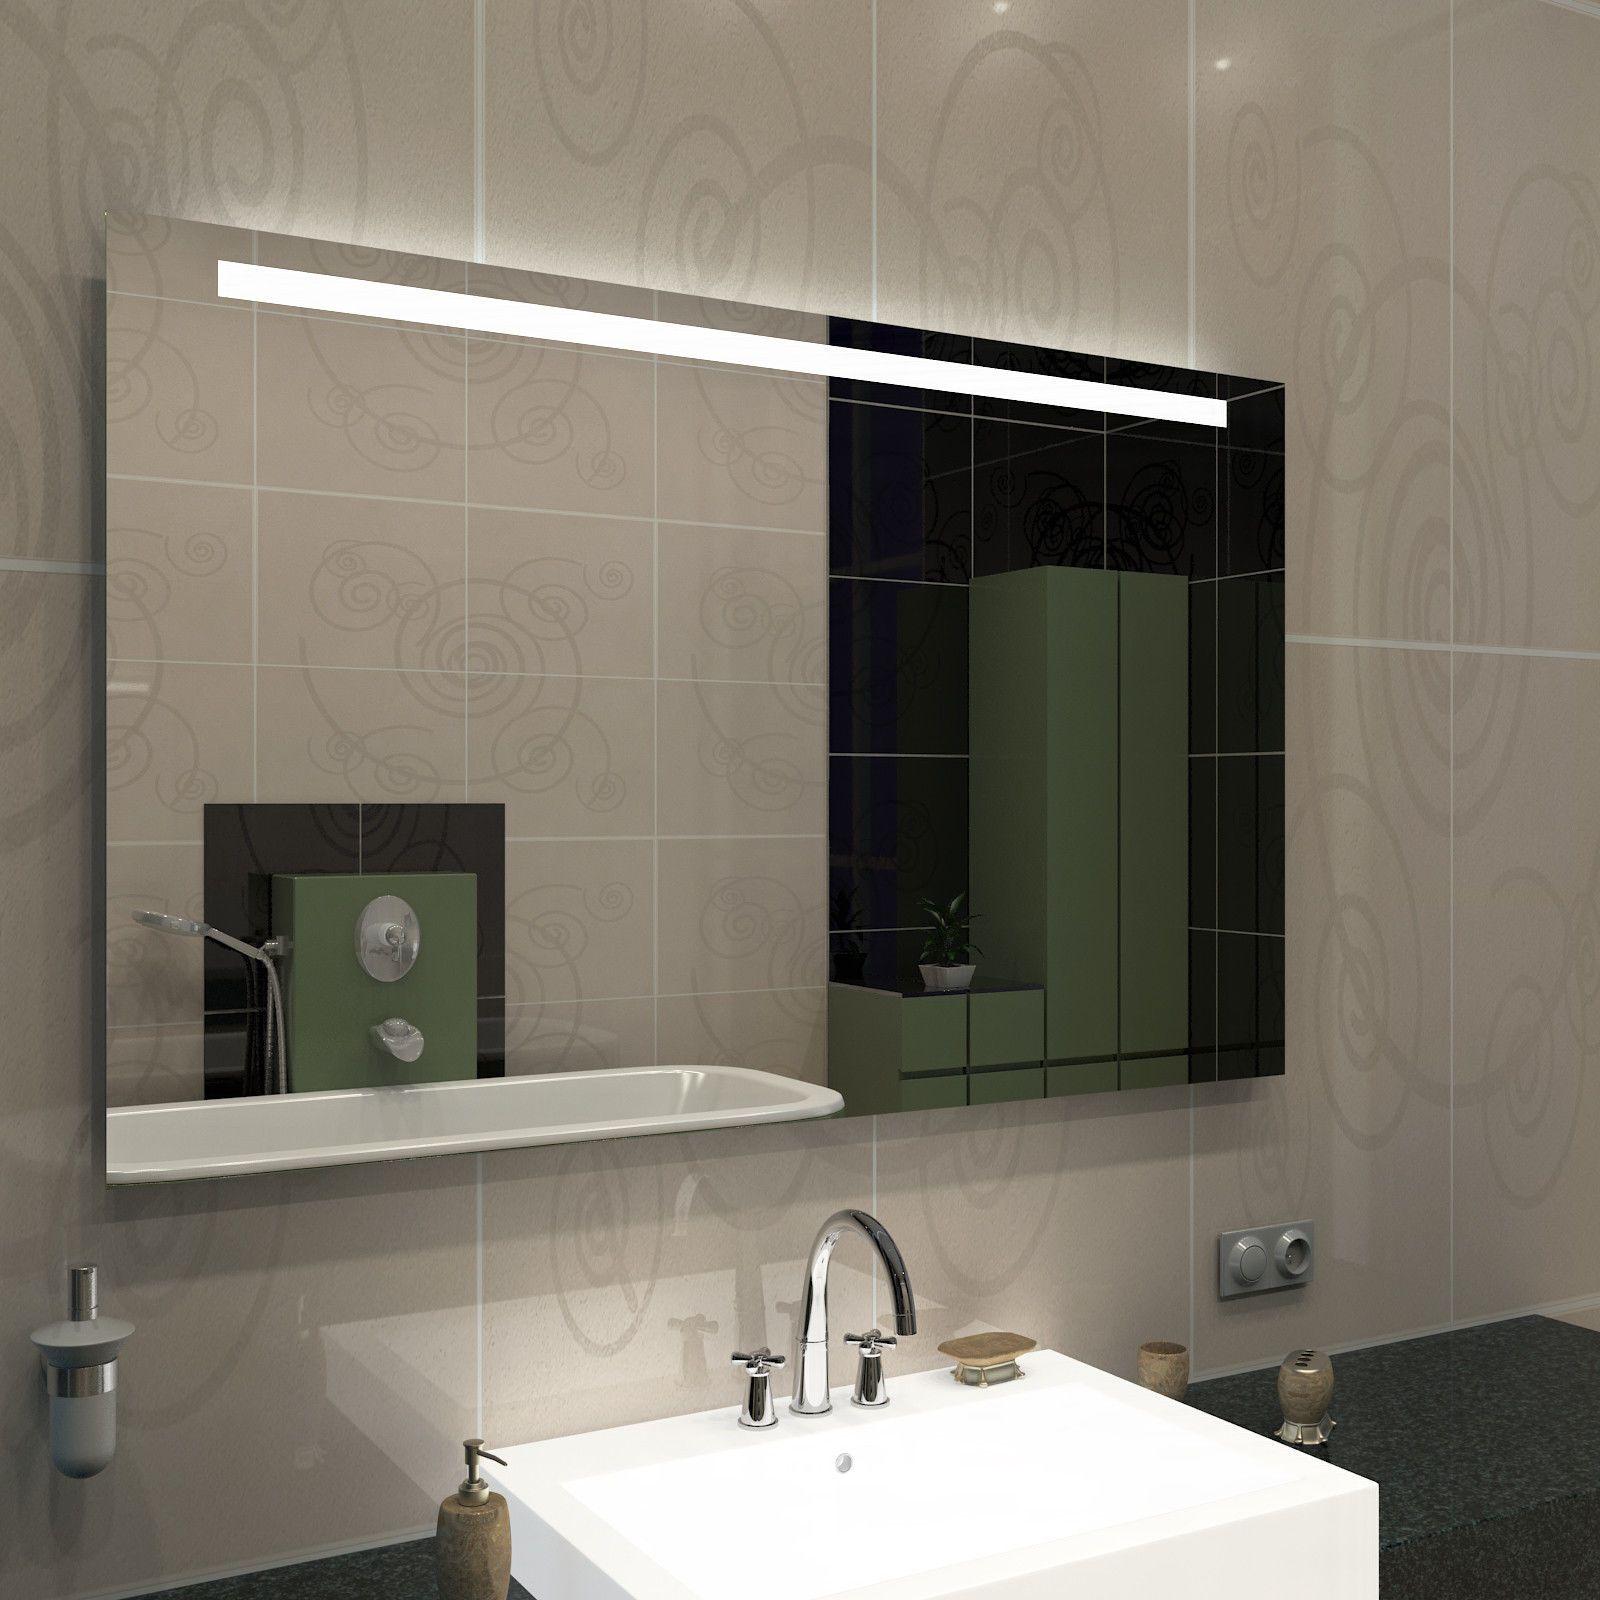 Ayna Ve Banyo Aynalari Fiyatlari Ayna Modelleri Com Badspiegel Spiegel Mit Beleuchtung Led Spiegel